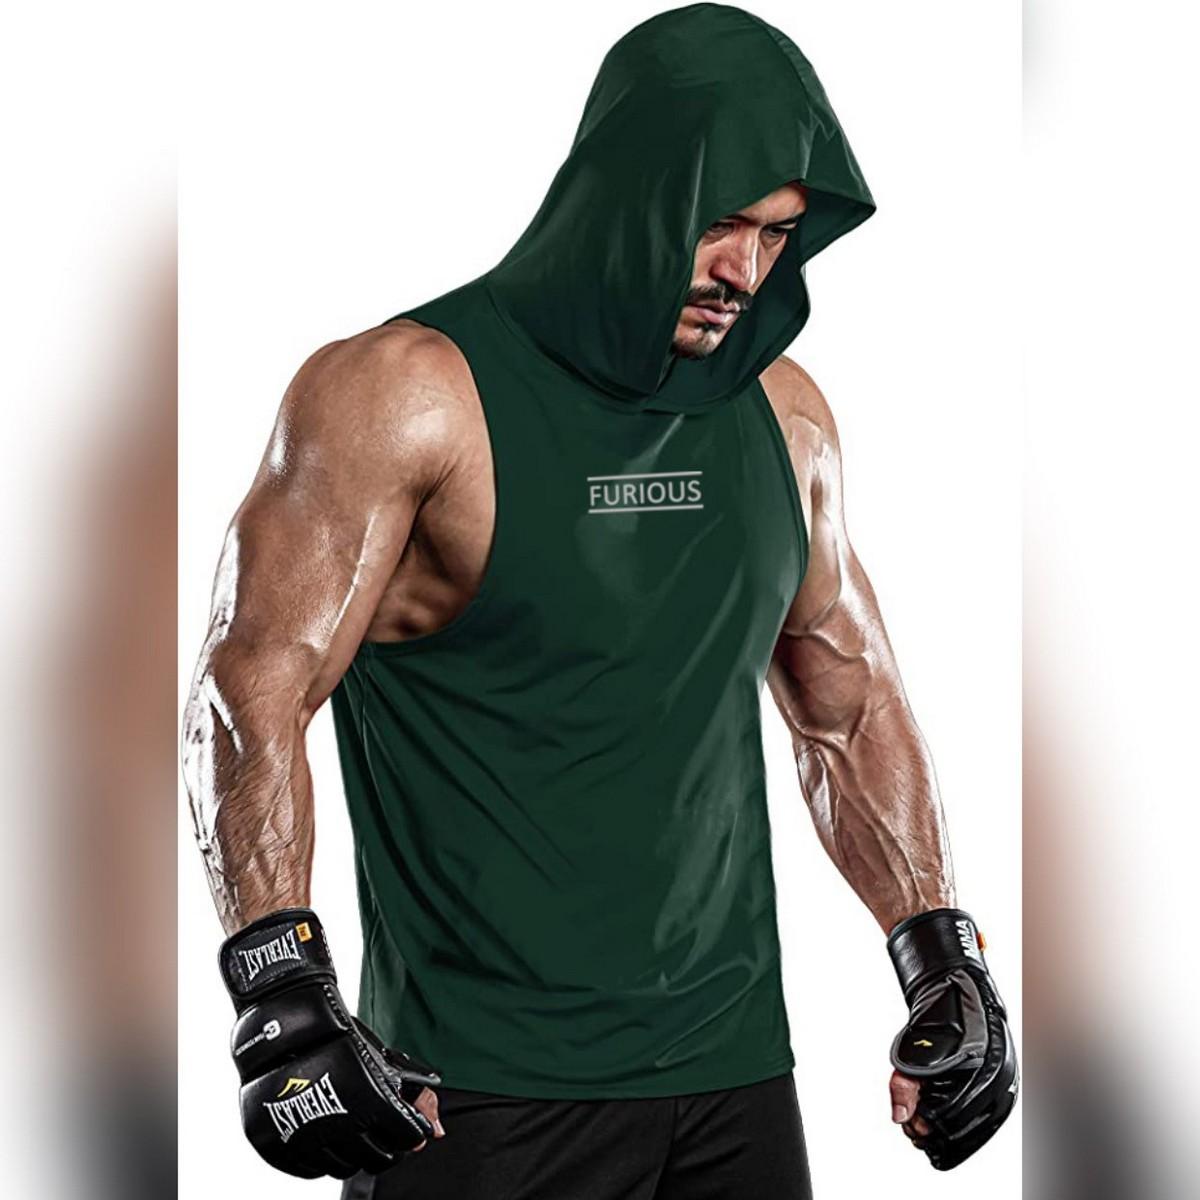 Men's Fitness Gym Muscle Bodybuilding Sleeveless Hoodies Tank Top  Gym Sandos for Men Sleeveless Hooded Tank Top  Cut off T shirt Sleeveless for Men Casual wear T shirt sleeveless for Men Top   Fashion Wear Shirt Hoodie Sleeveless Men T shirt for Men